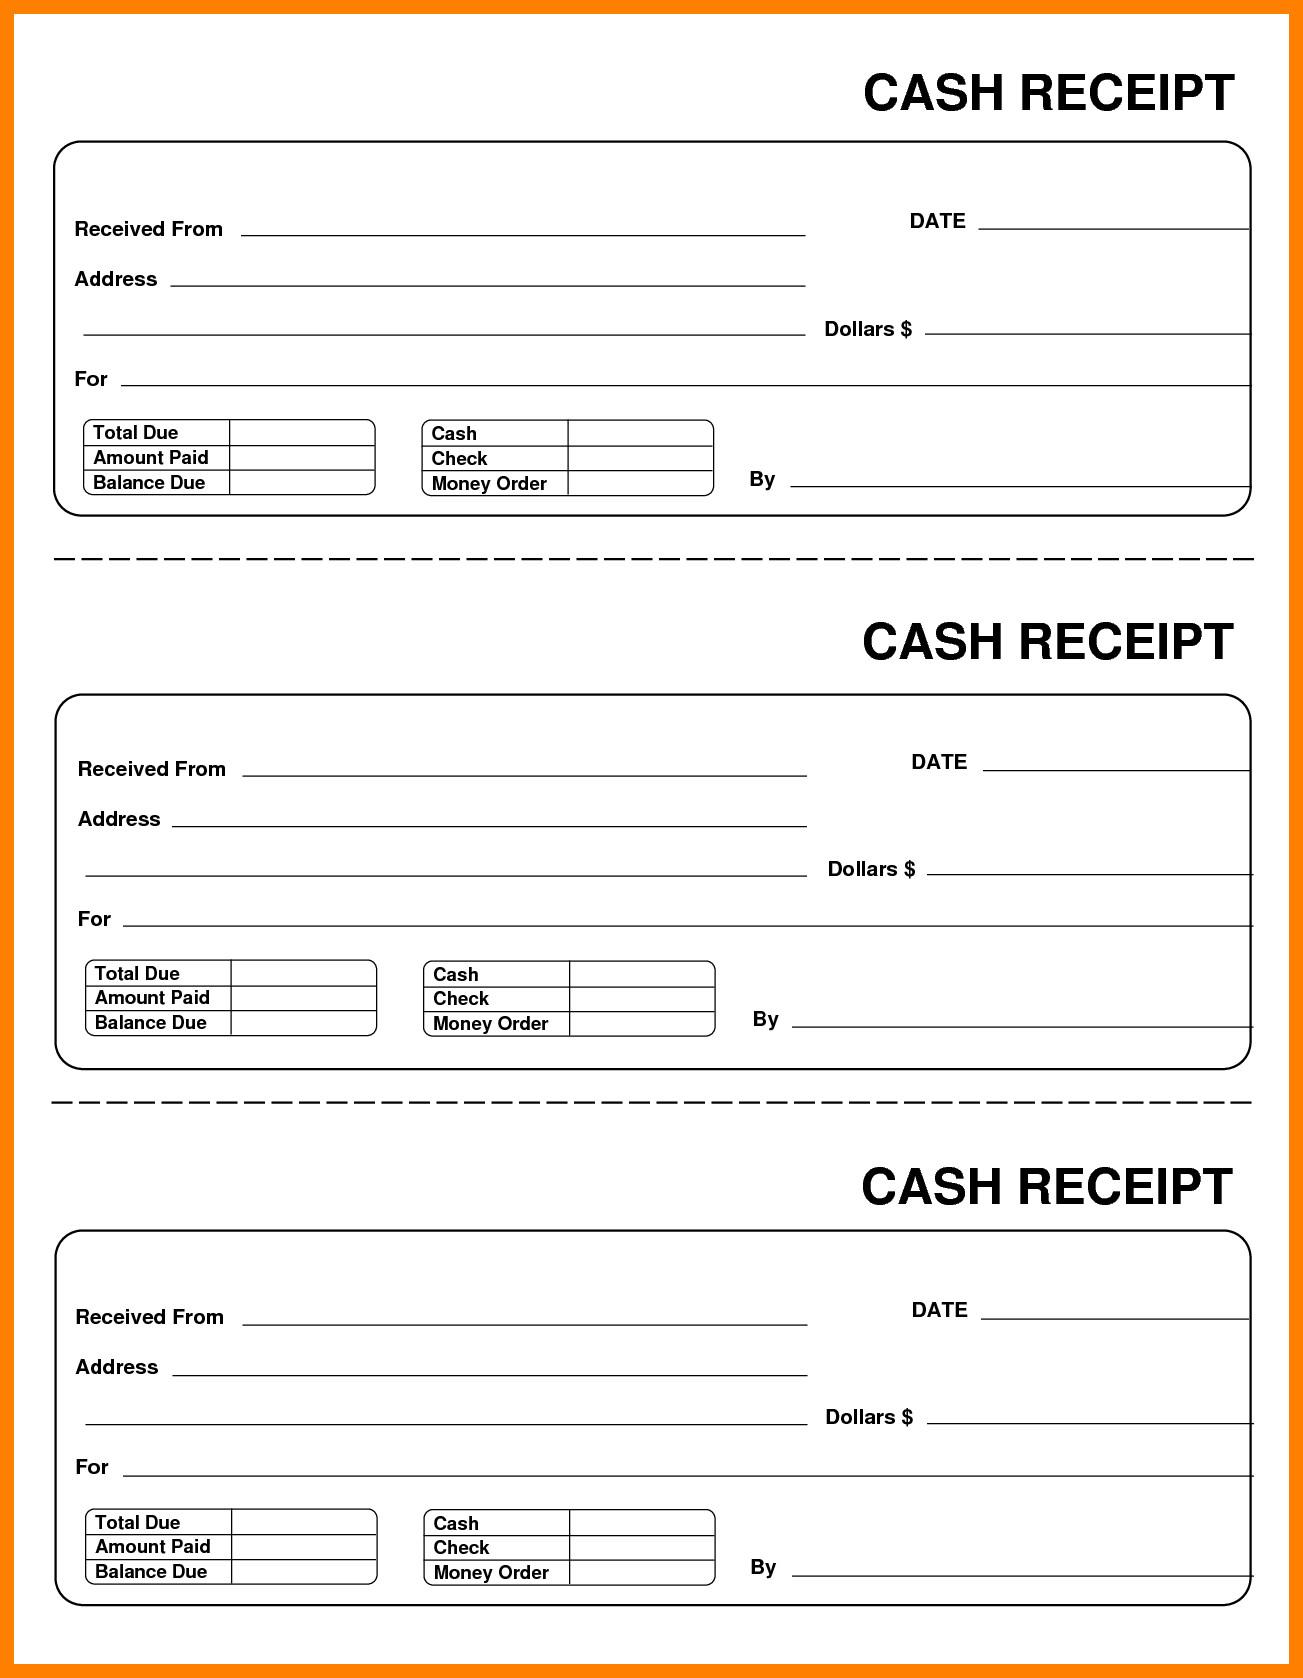 Cash Receipt Template Word Doc Cash Receipt Template Word Doc